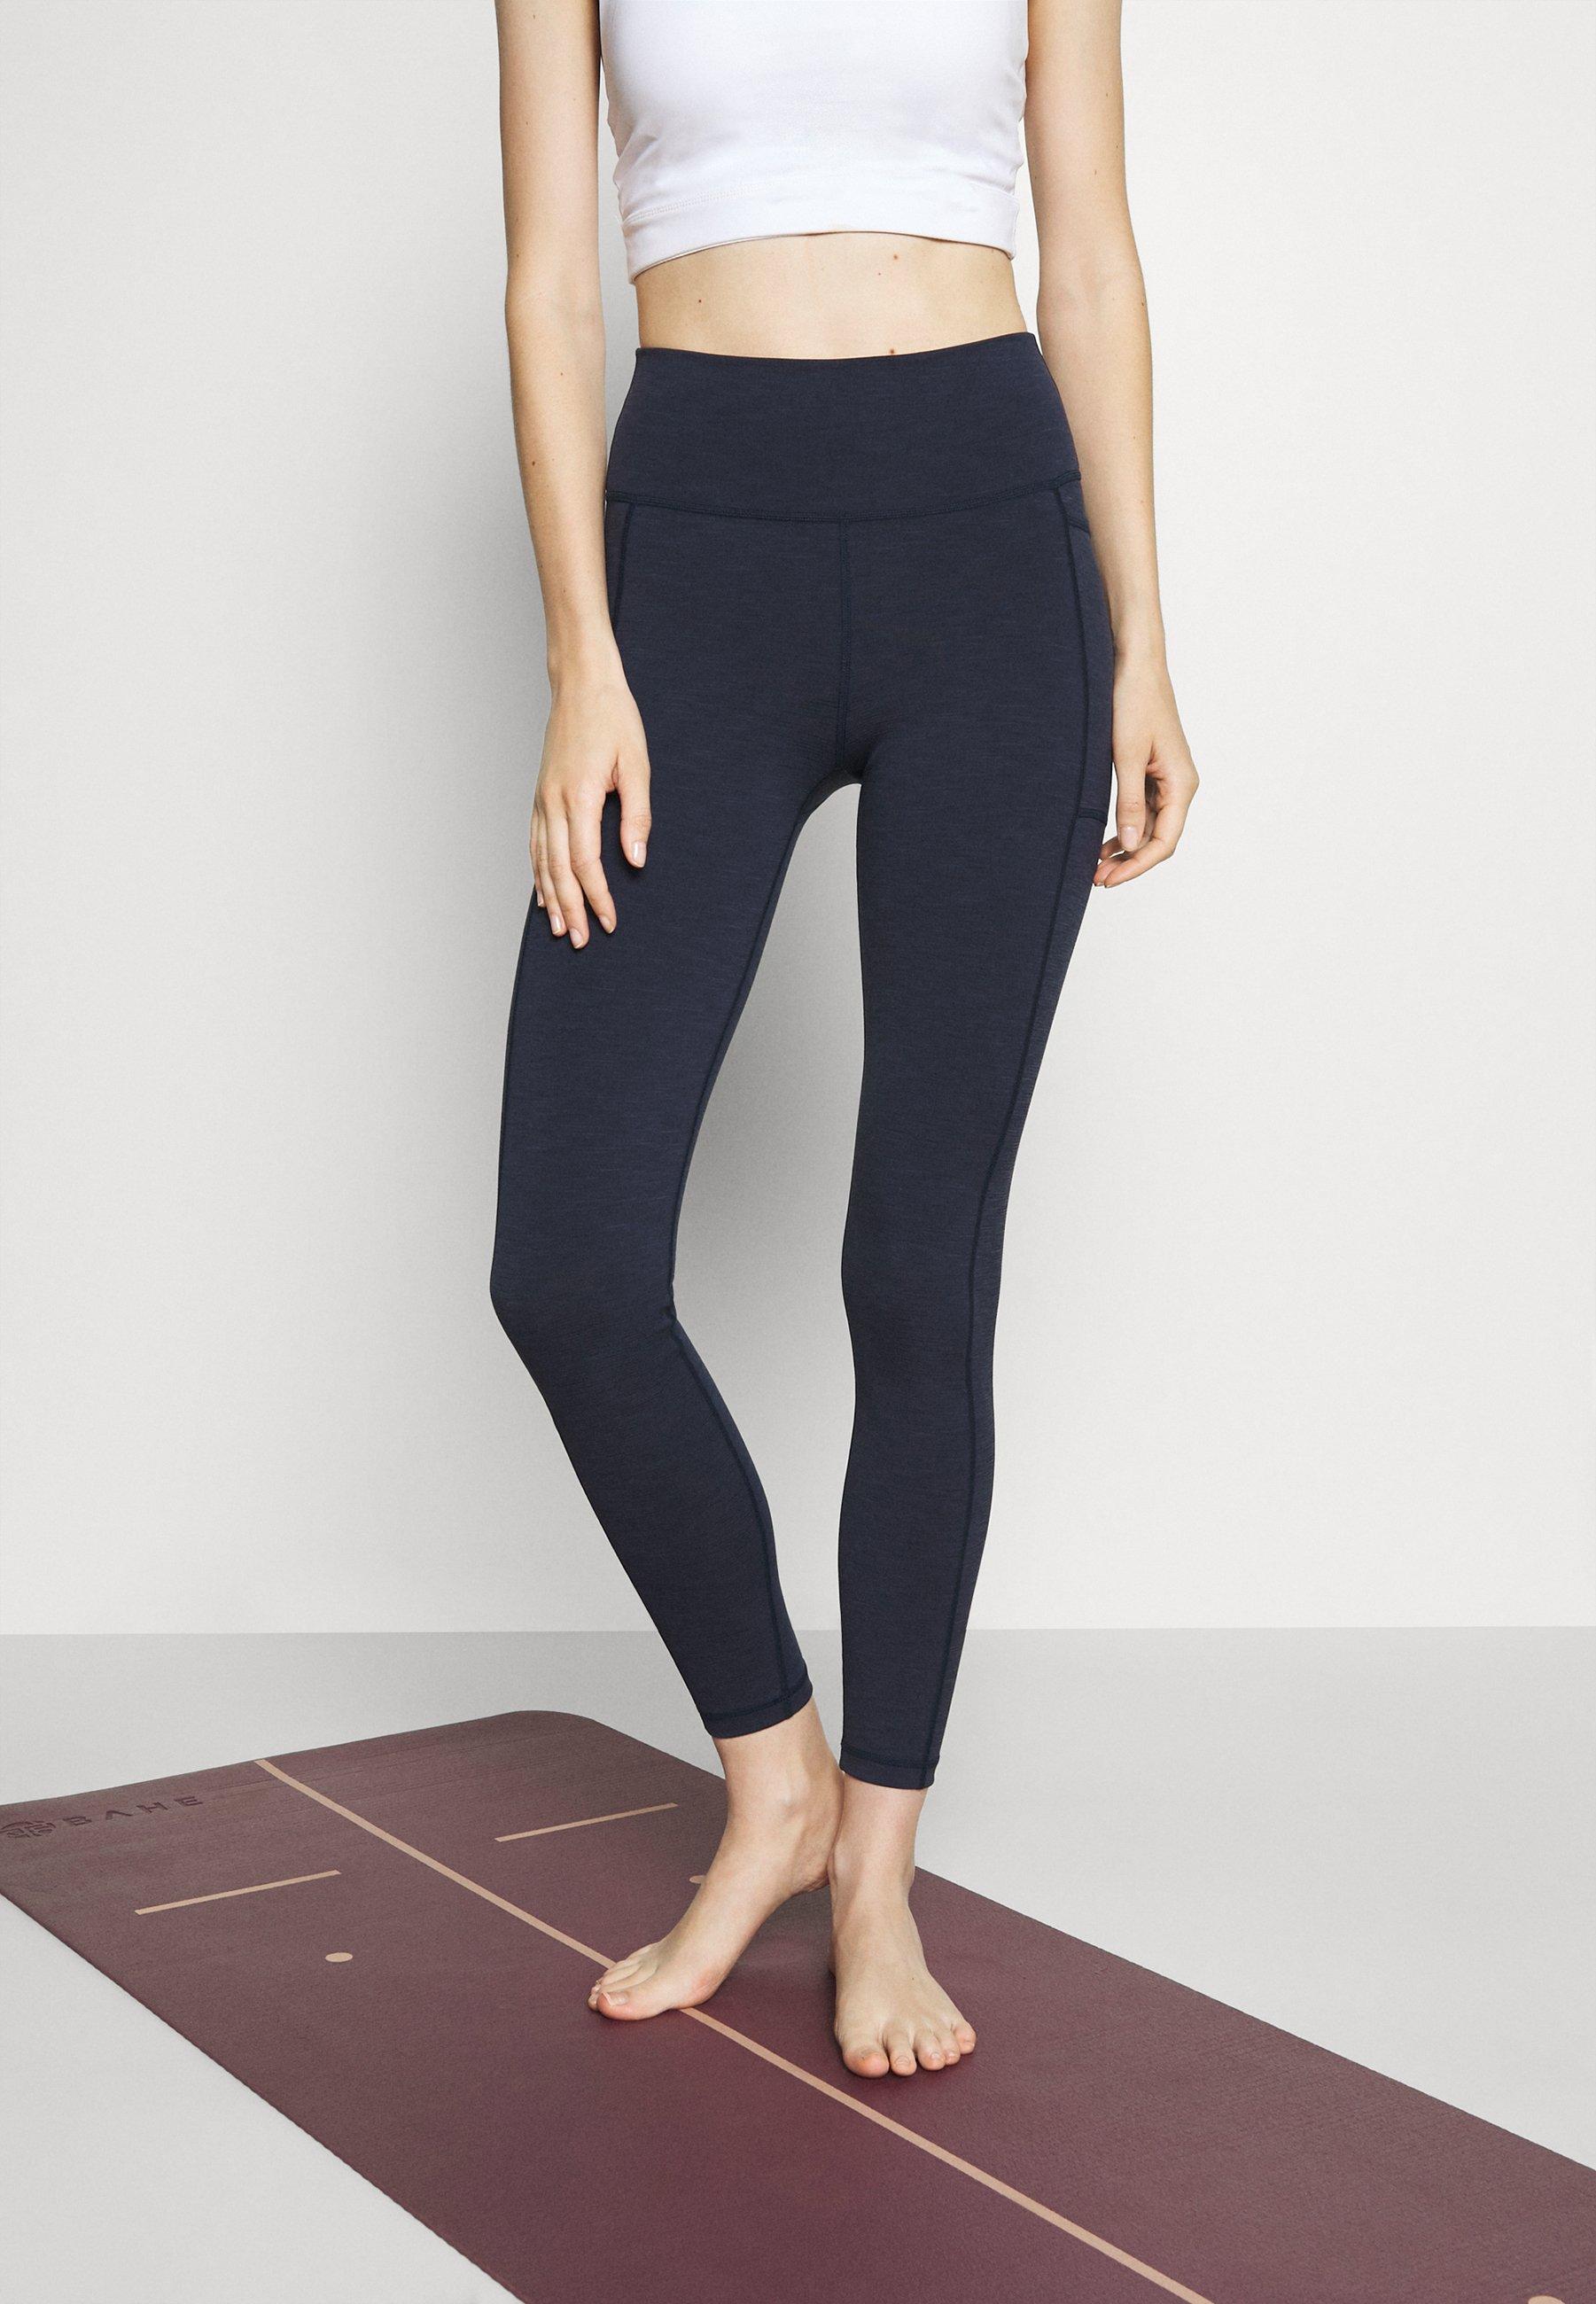 Femme SUPER SCULPT YOGA LEGGINGS - Collants